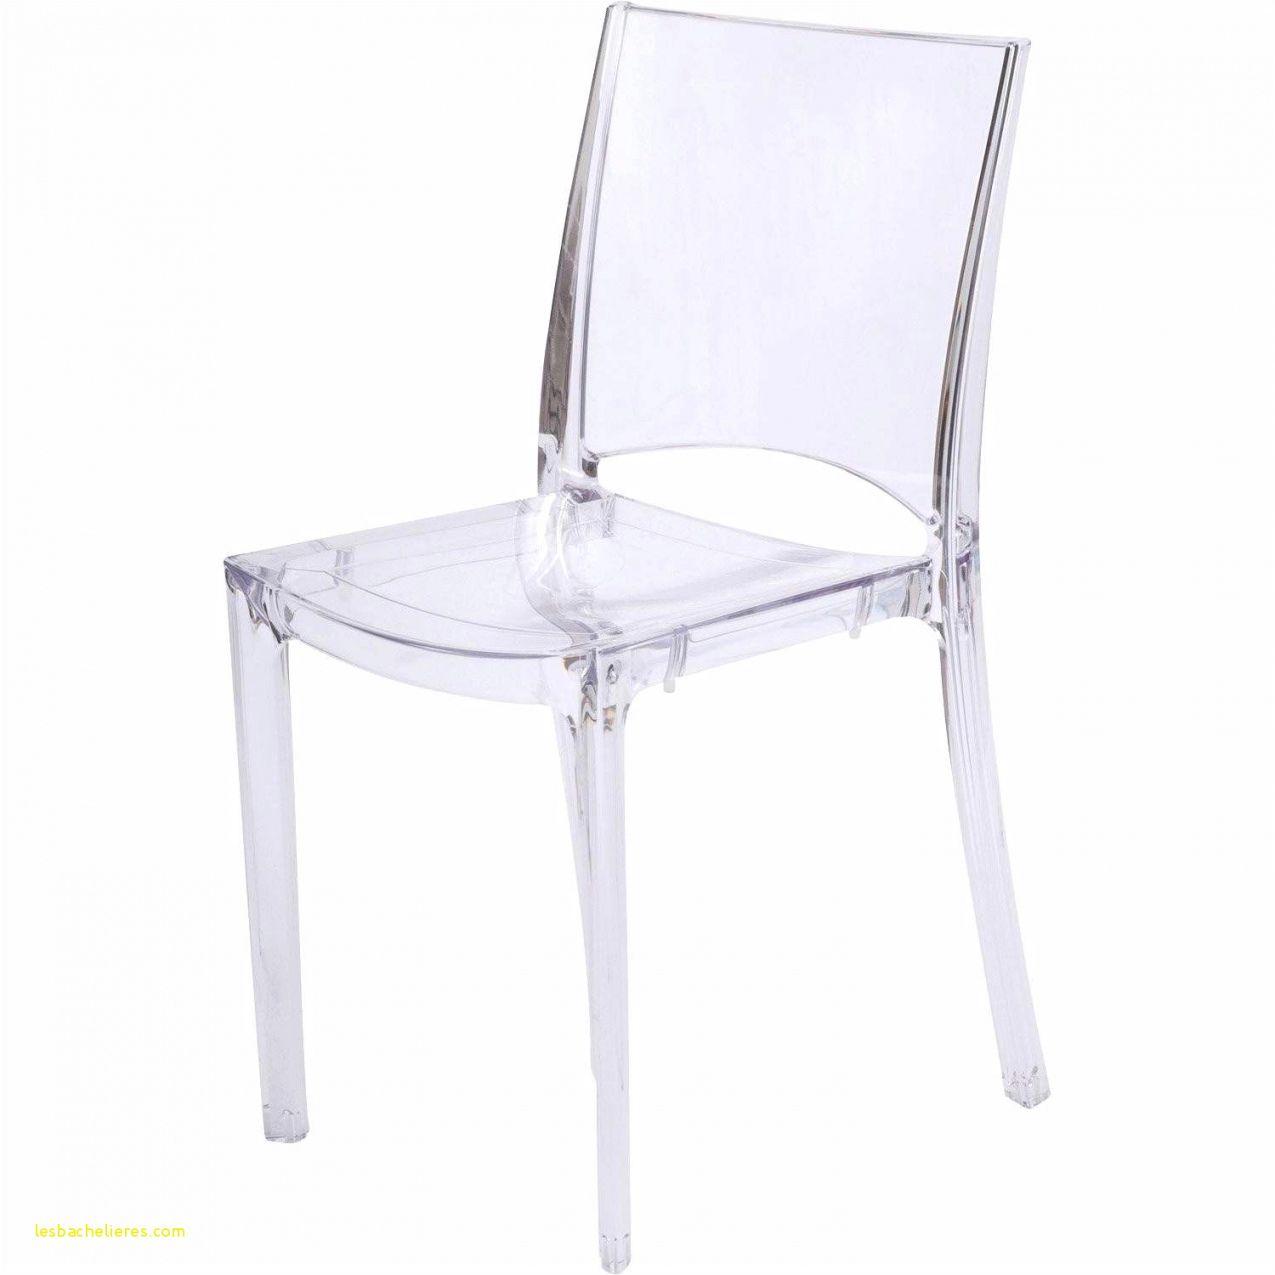 55 Tableau Ardoise Cuisine Ikea 2017 Chair Kitchen Design